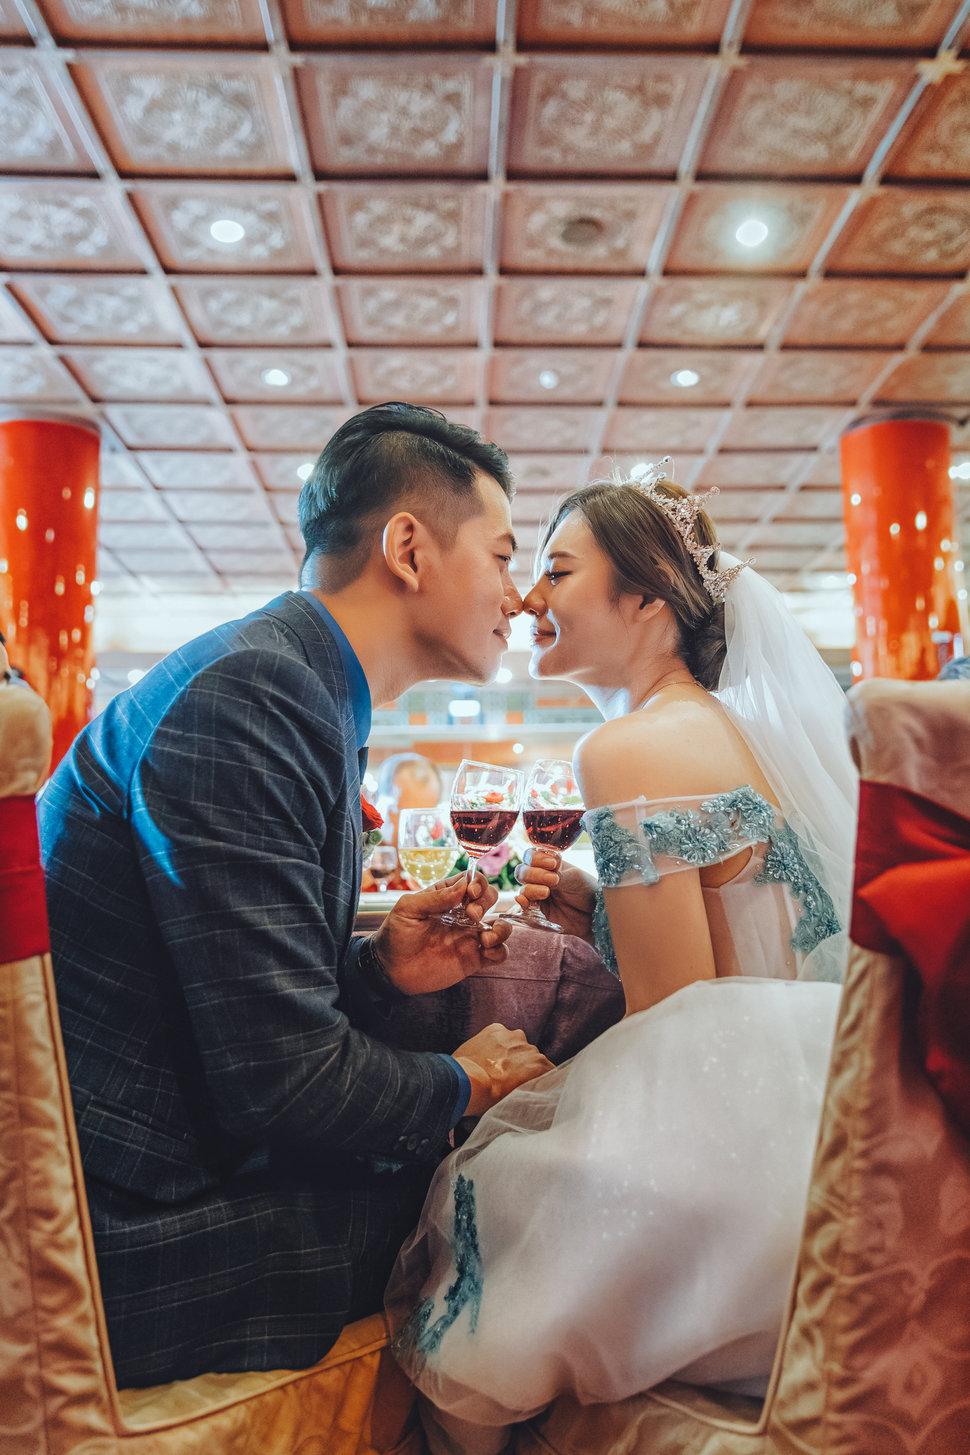 20190914-20190914-QUAN4757-編輯 - QUAN  婚禮紀錄 / 影像工作室《結婚吧》